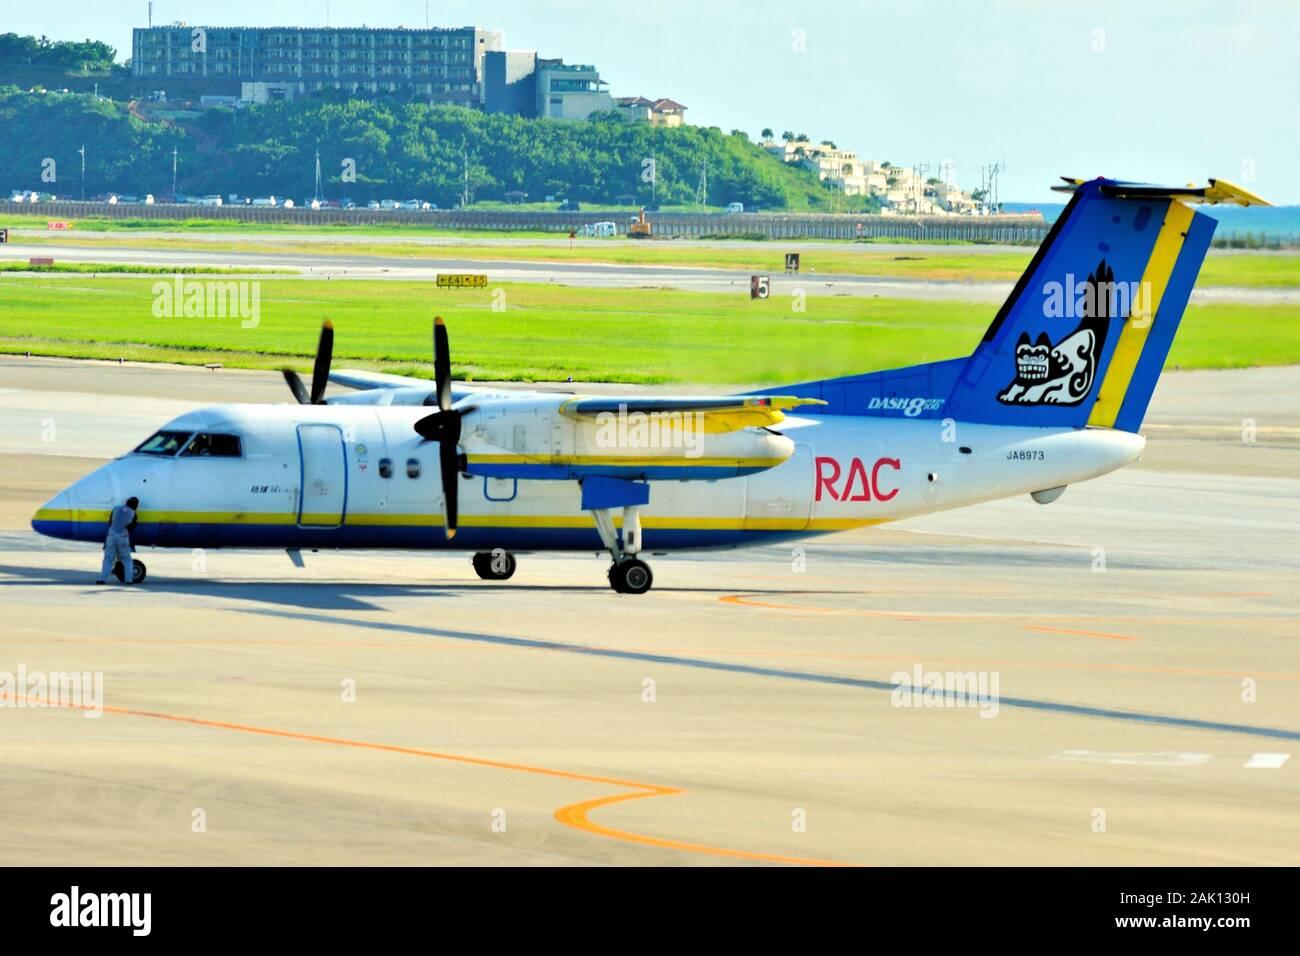 Ryukyu Air Commuter, RAC, De Havilland Canada DHC Dash 8, -8-100, JA8973, Fertig zur Abreise Flughafen Naha, Okinawa, Japan Stockfoto